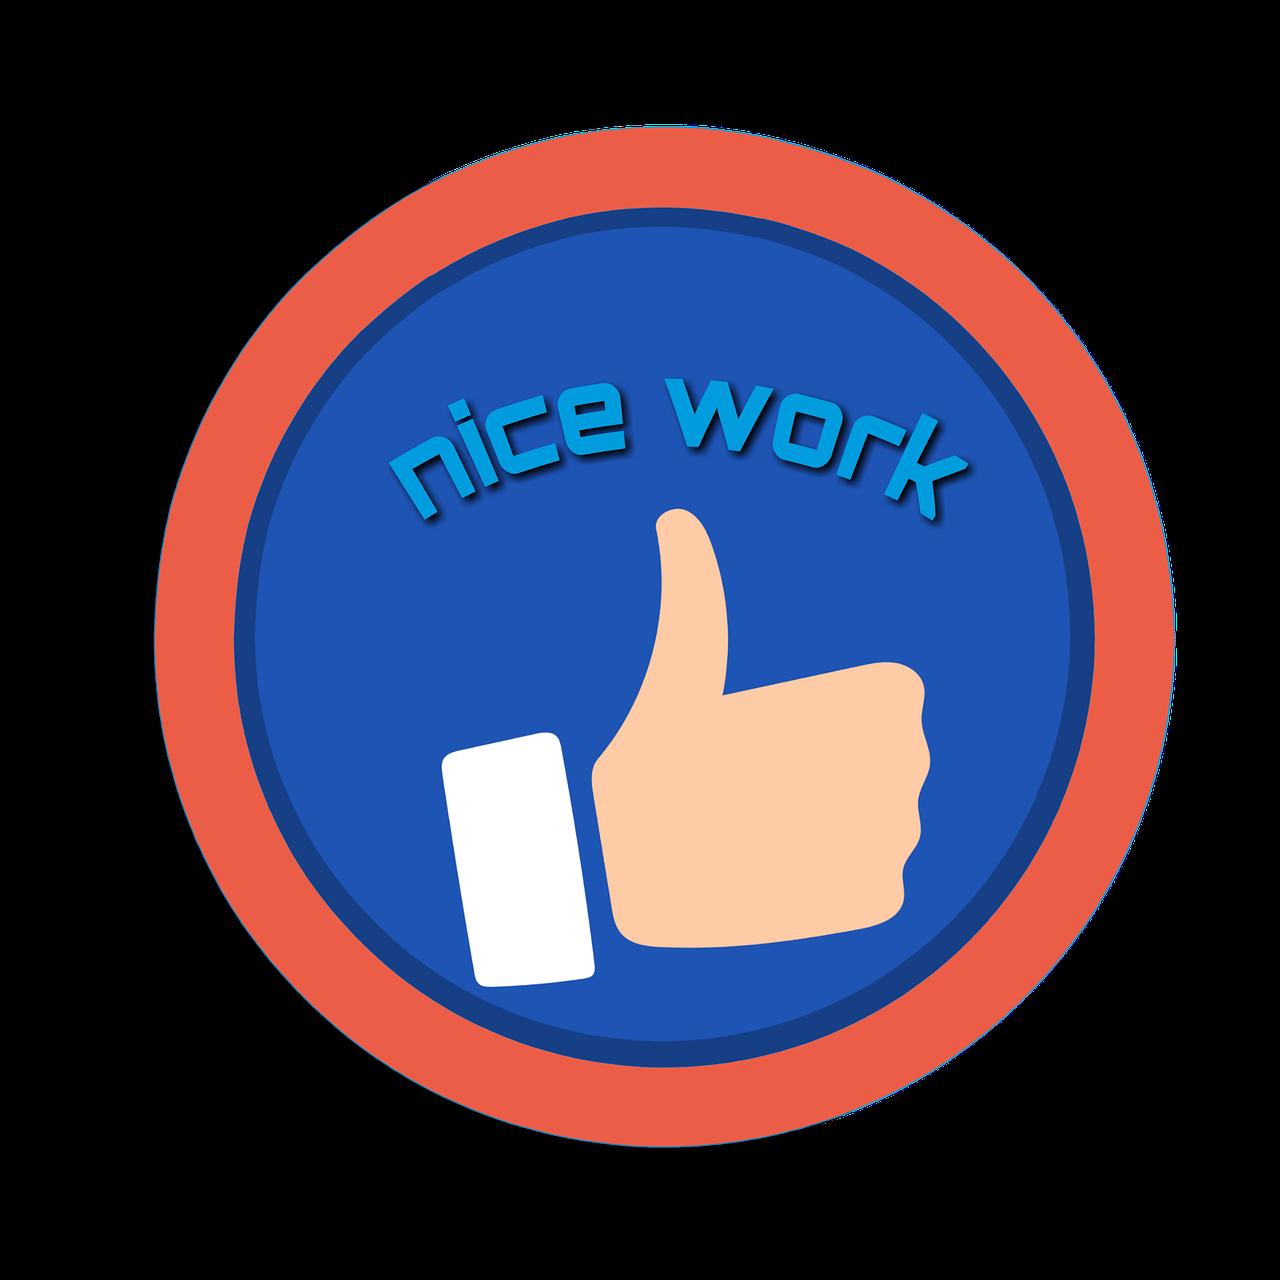 Motivation,nice work,click,clipart,sticker.